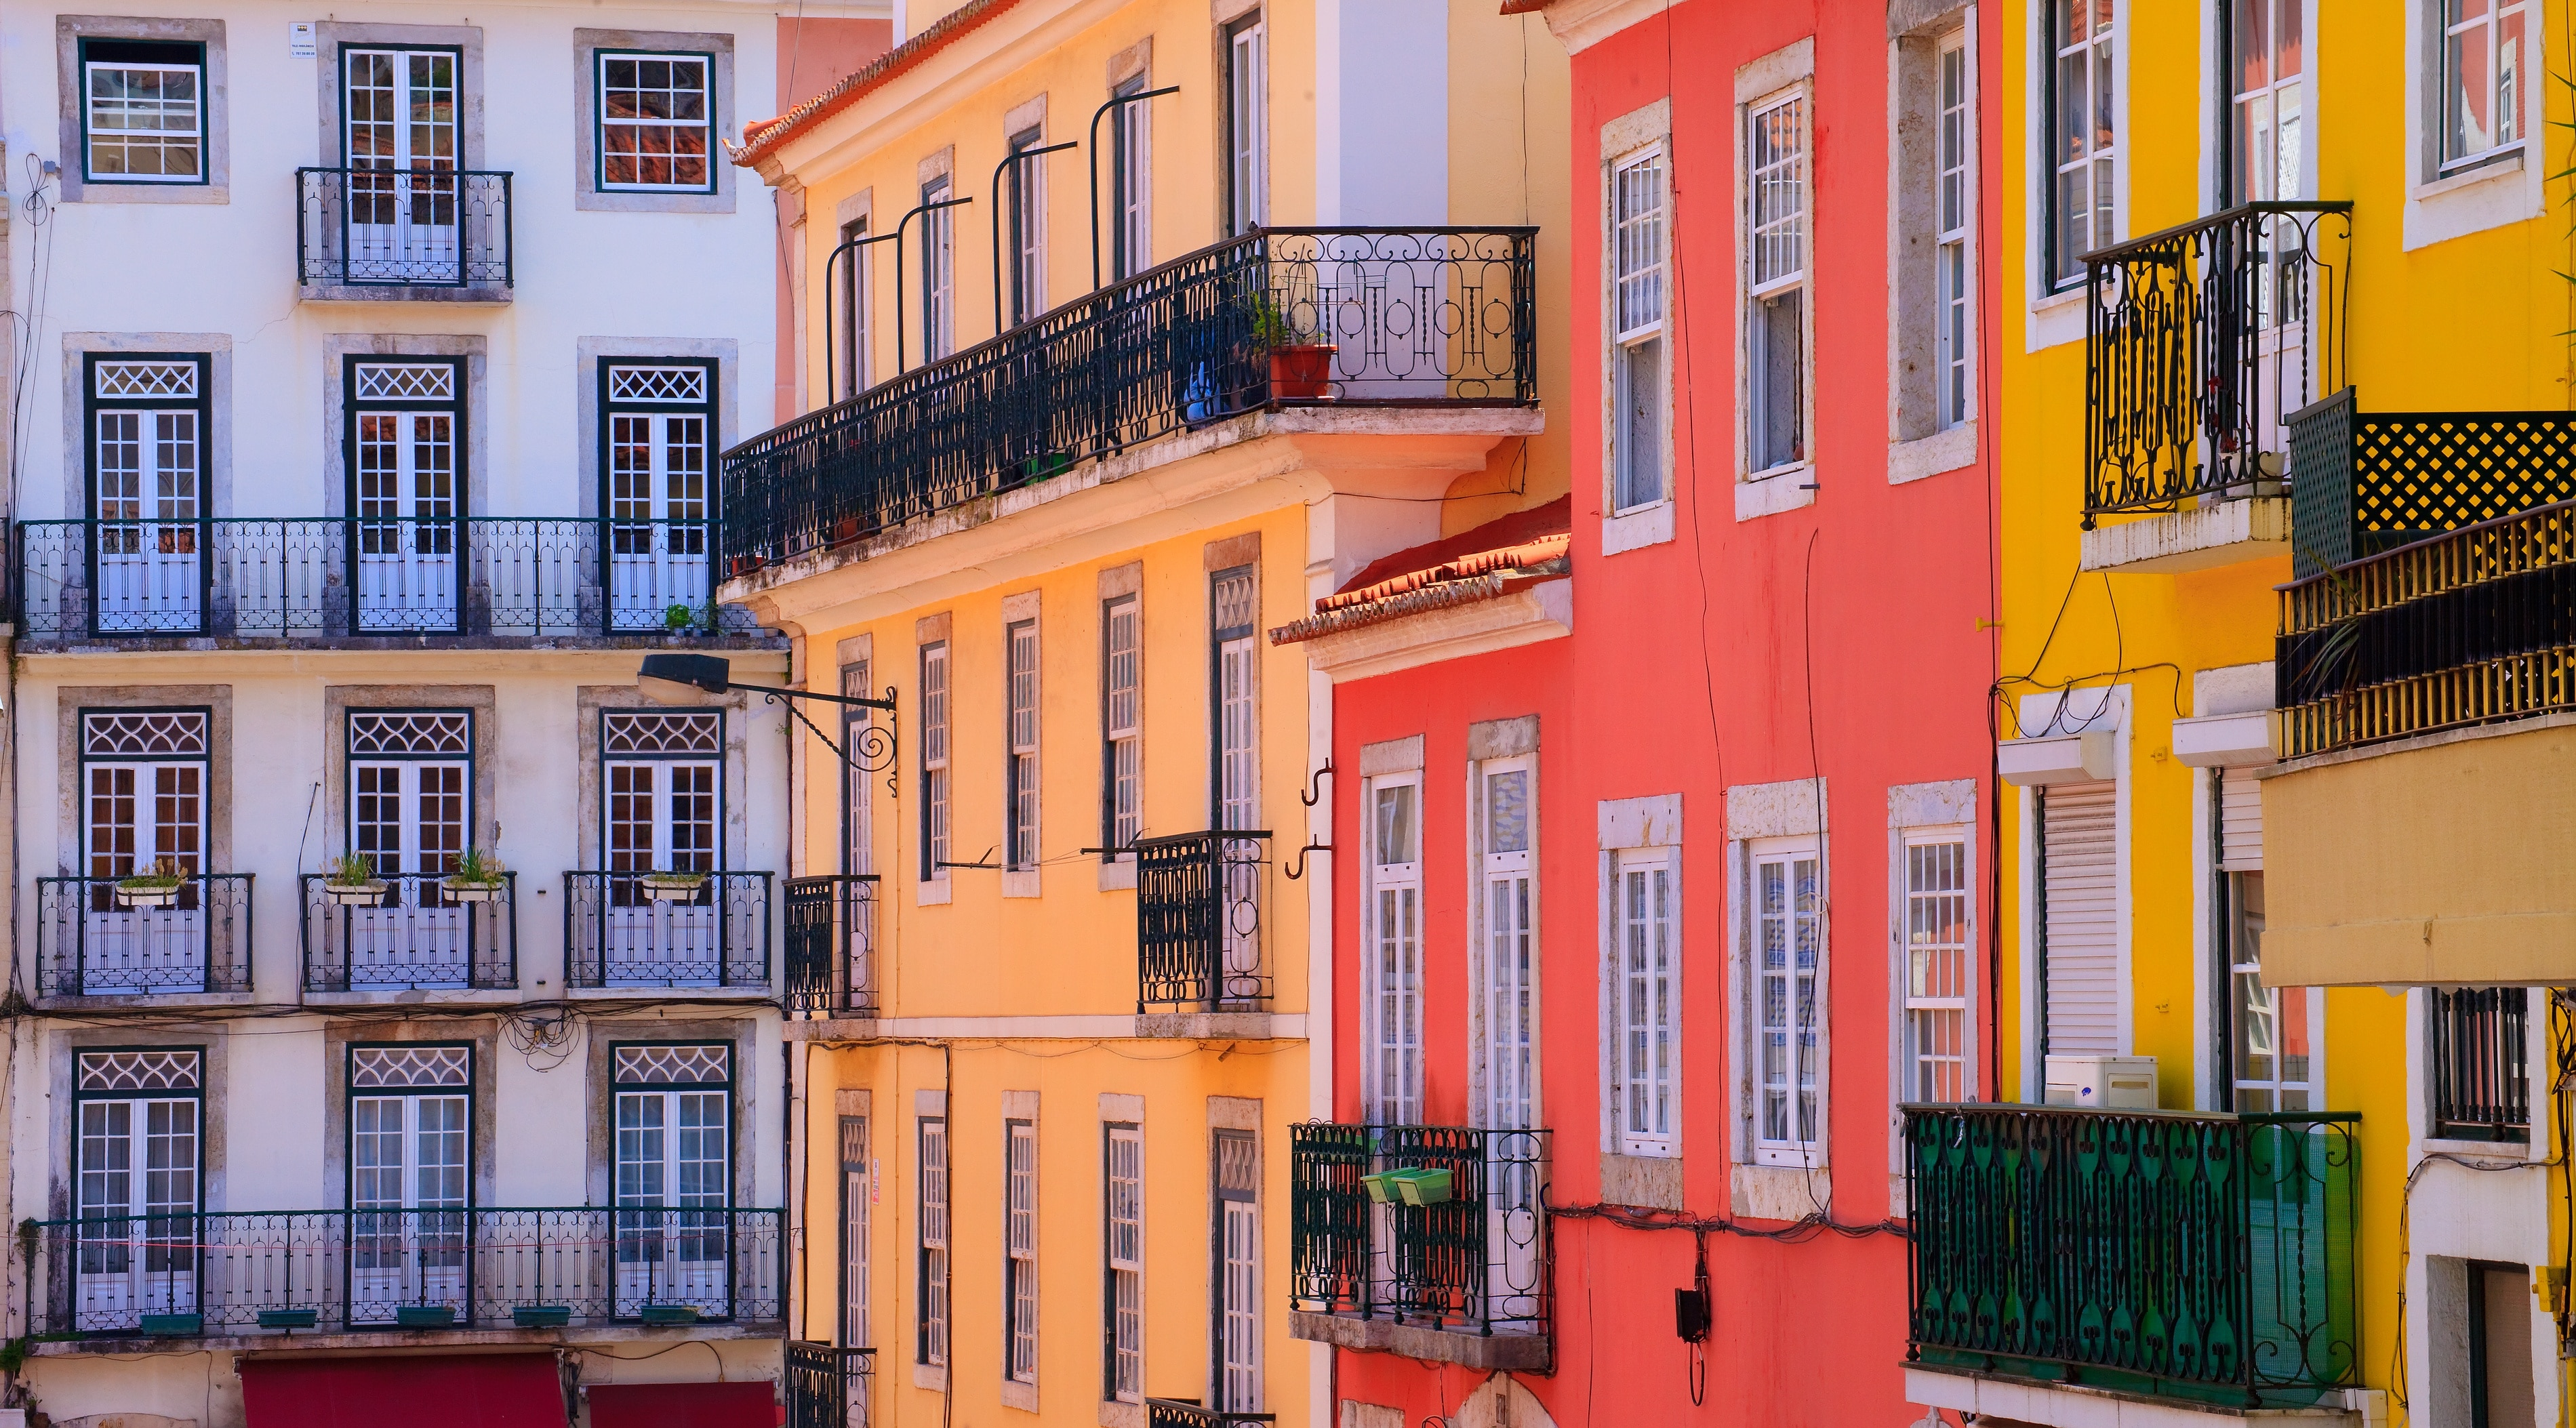 Bairro Alto, Lisbon, Lisbon District, Portugal